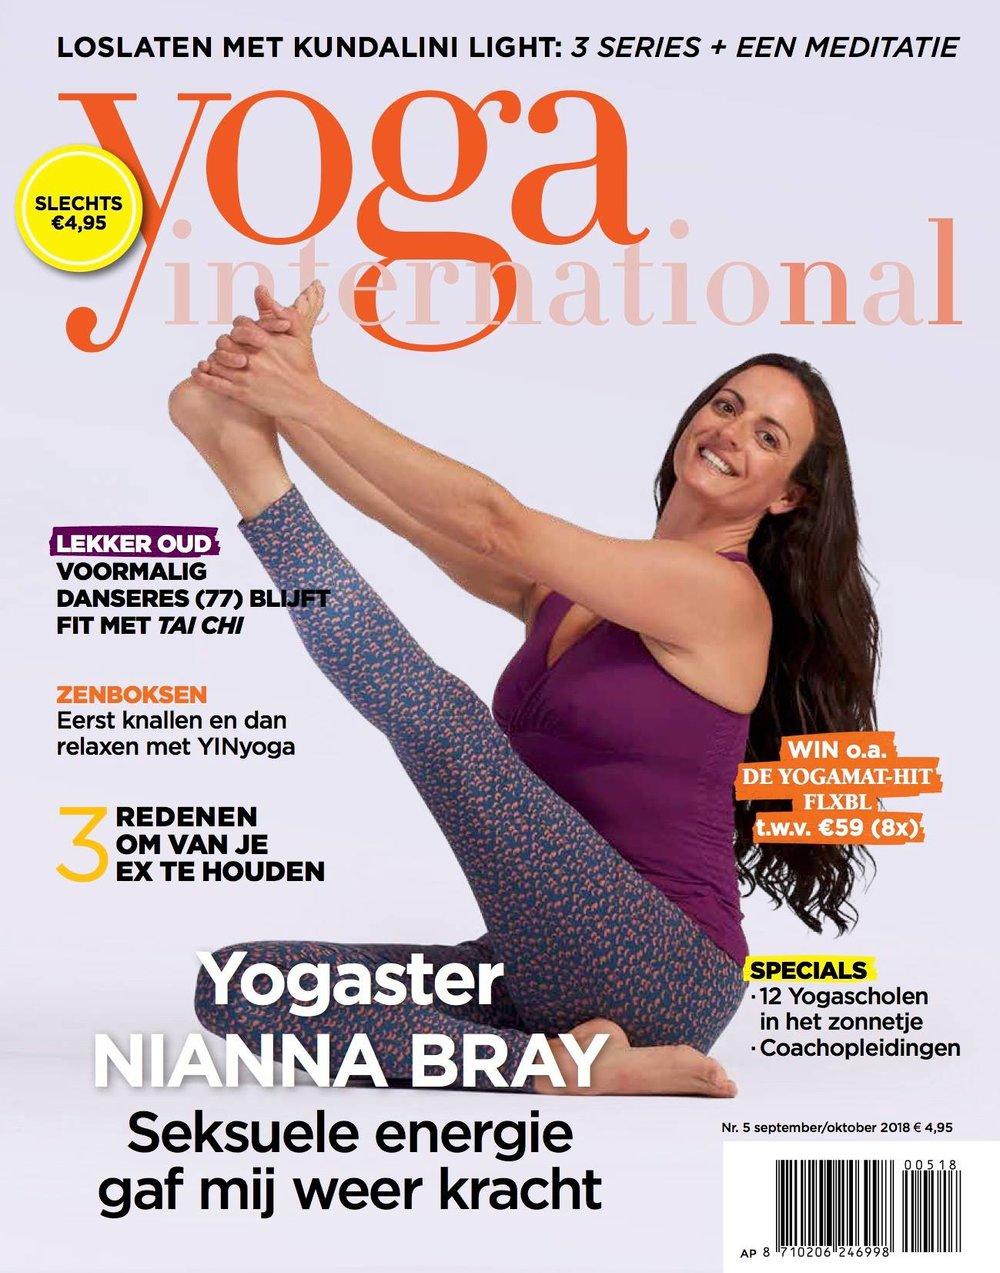 Yoga International - Hoalland 2018